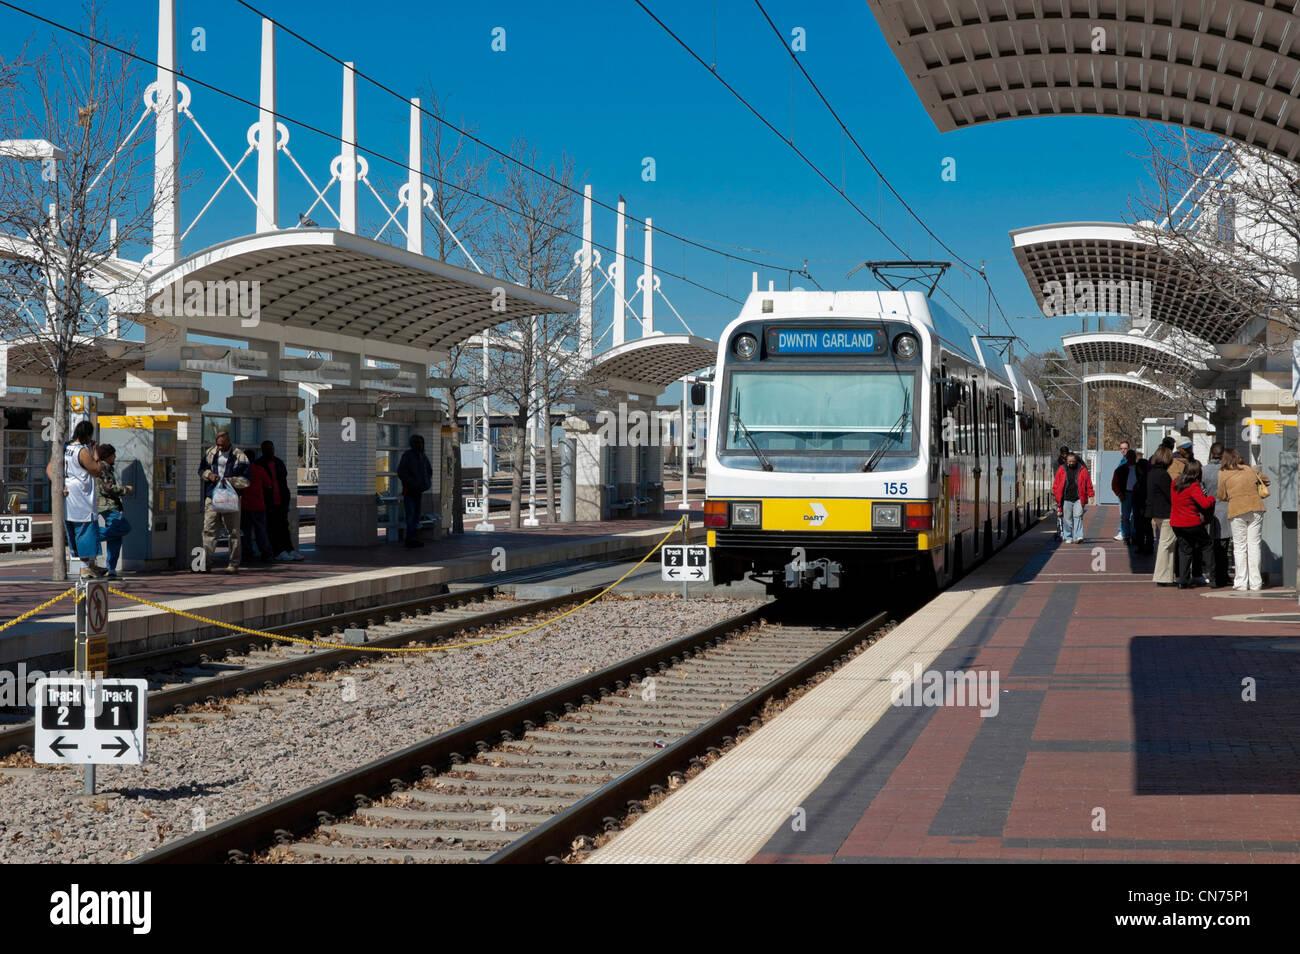 Les navetteurs sur la plate-forme de la gare prendre un train DART à la gare Union, Dallas, Texas Photo Stock